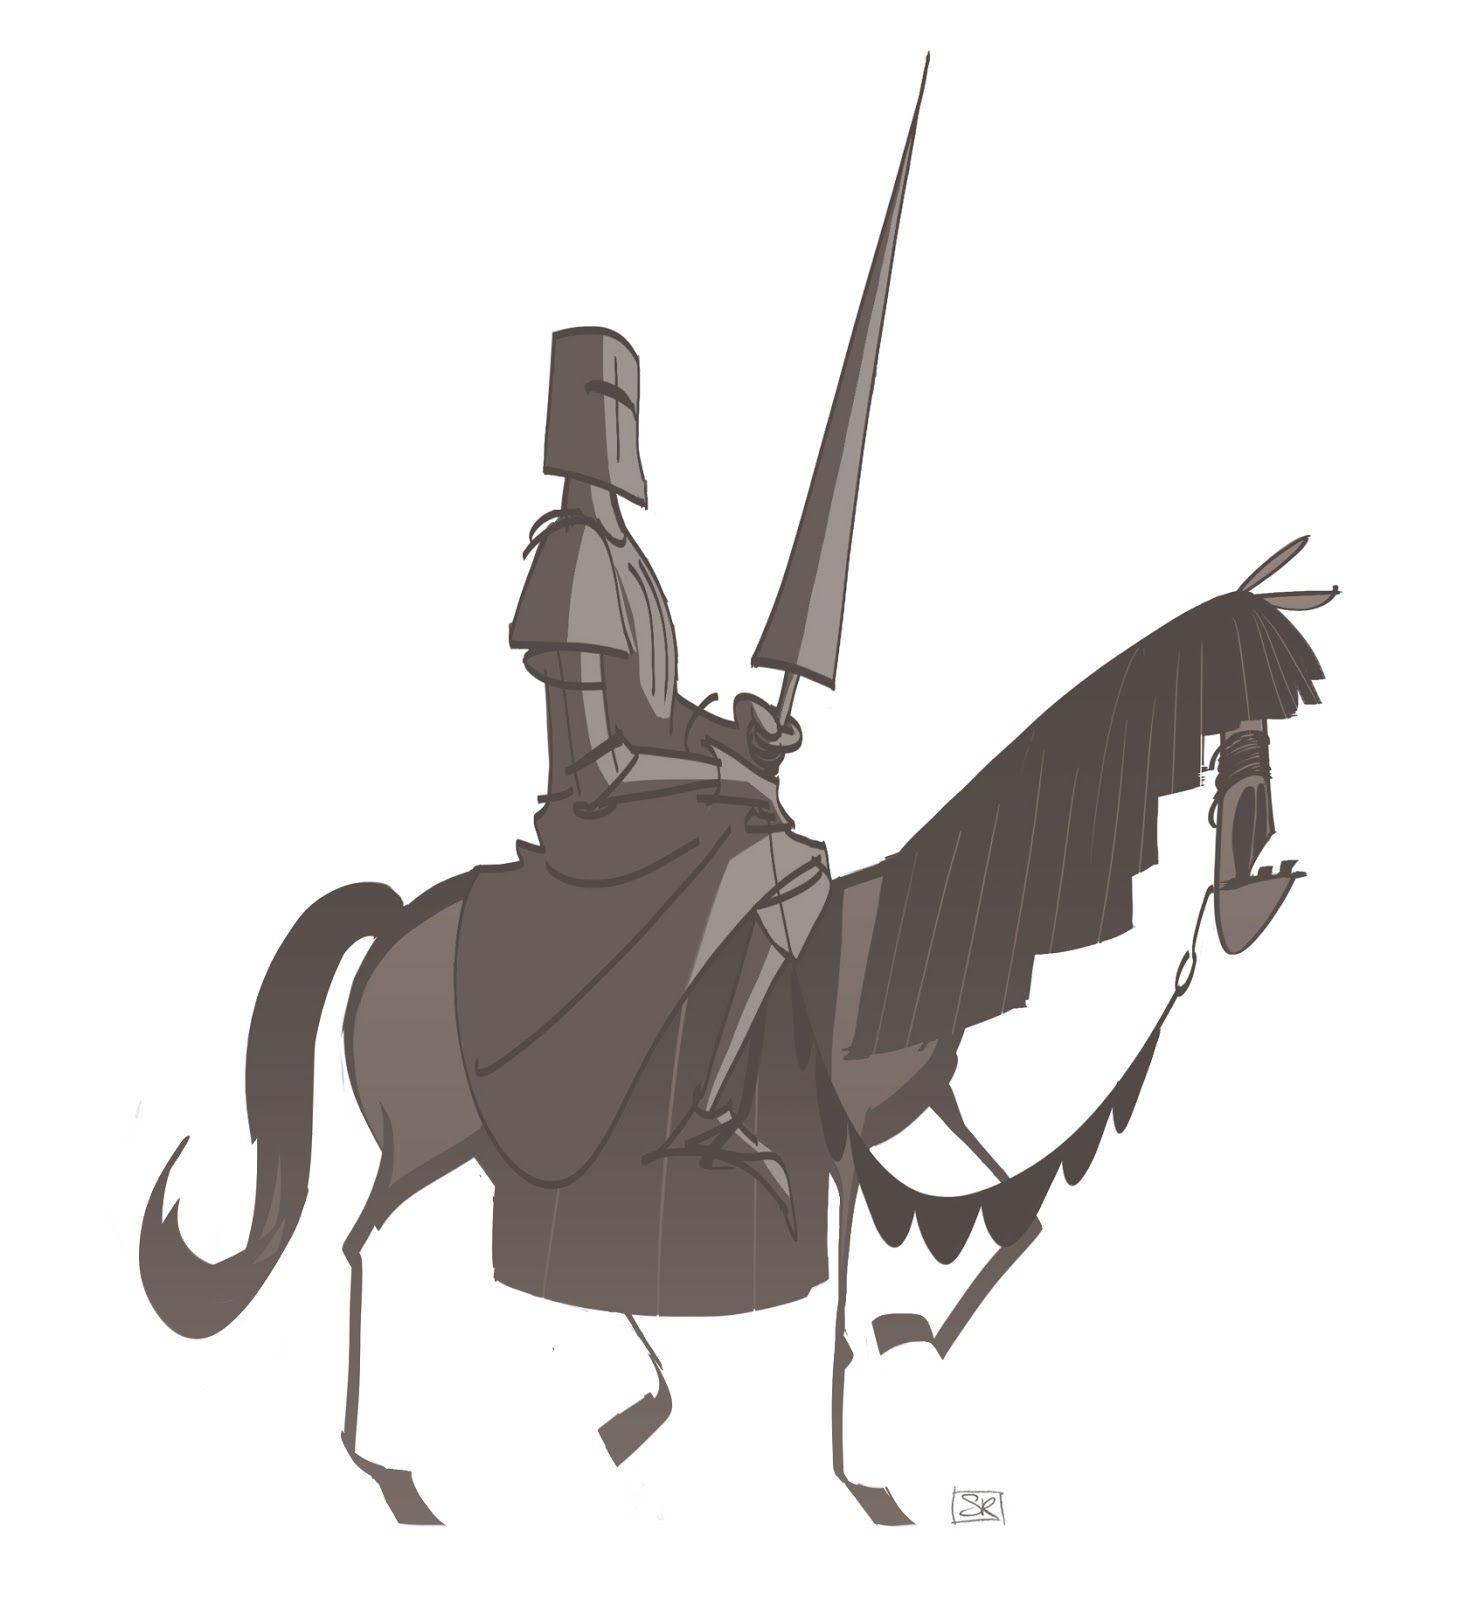 seb rouxel: The dark knight